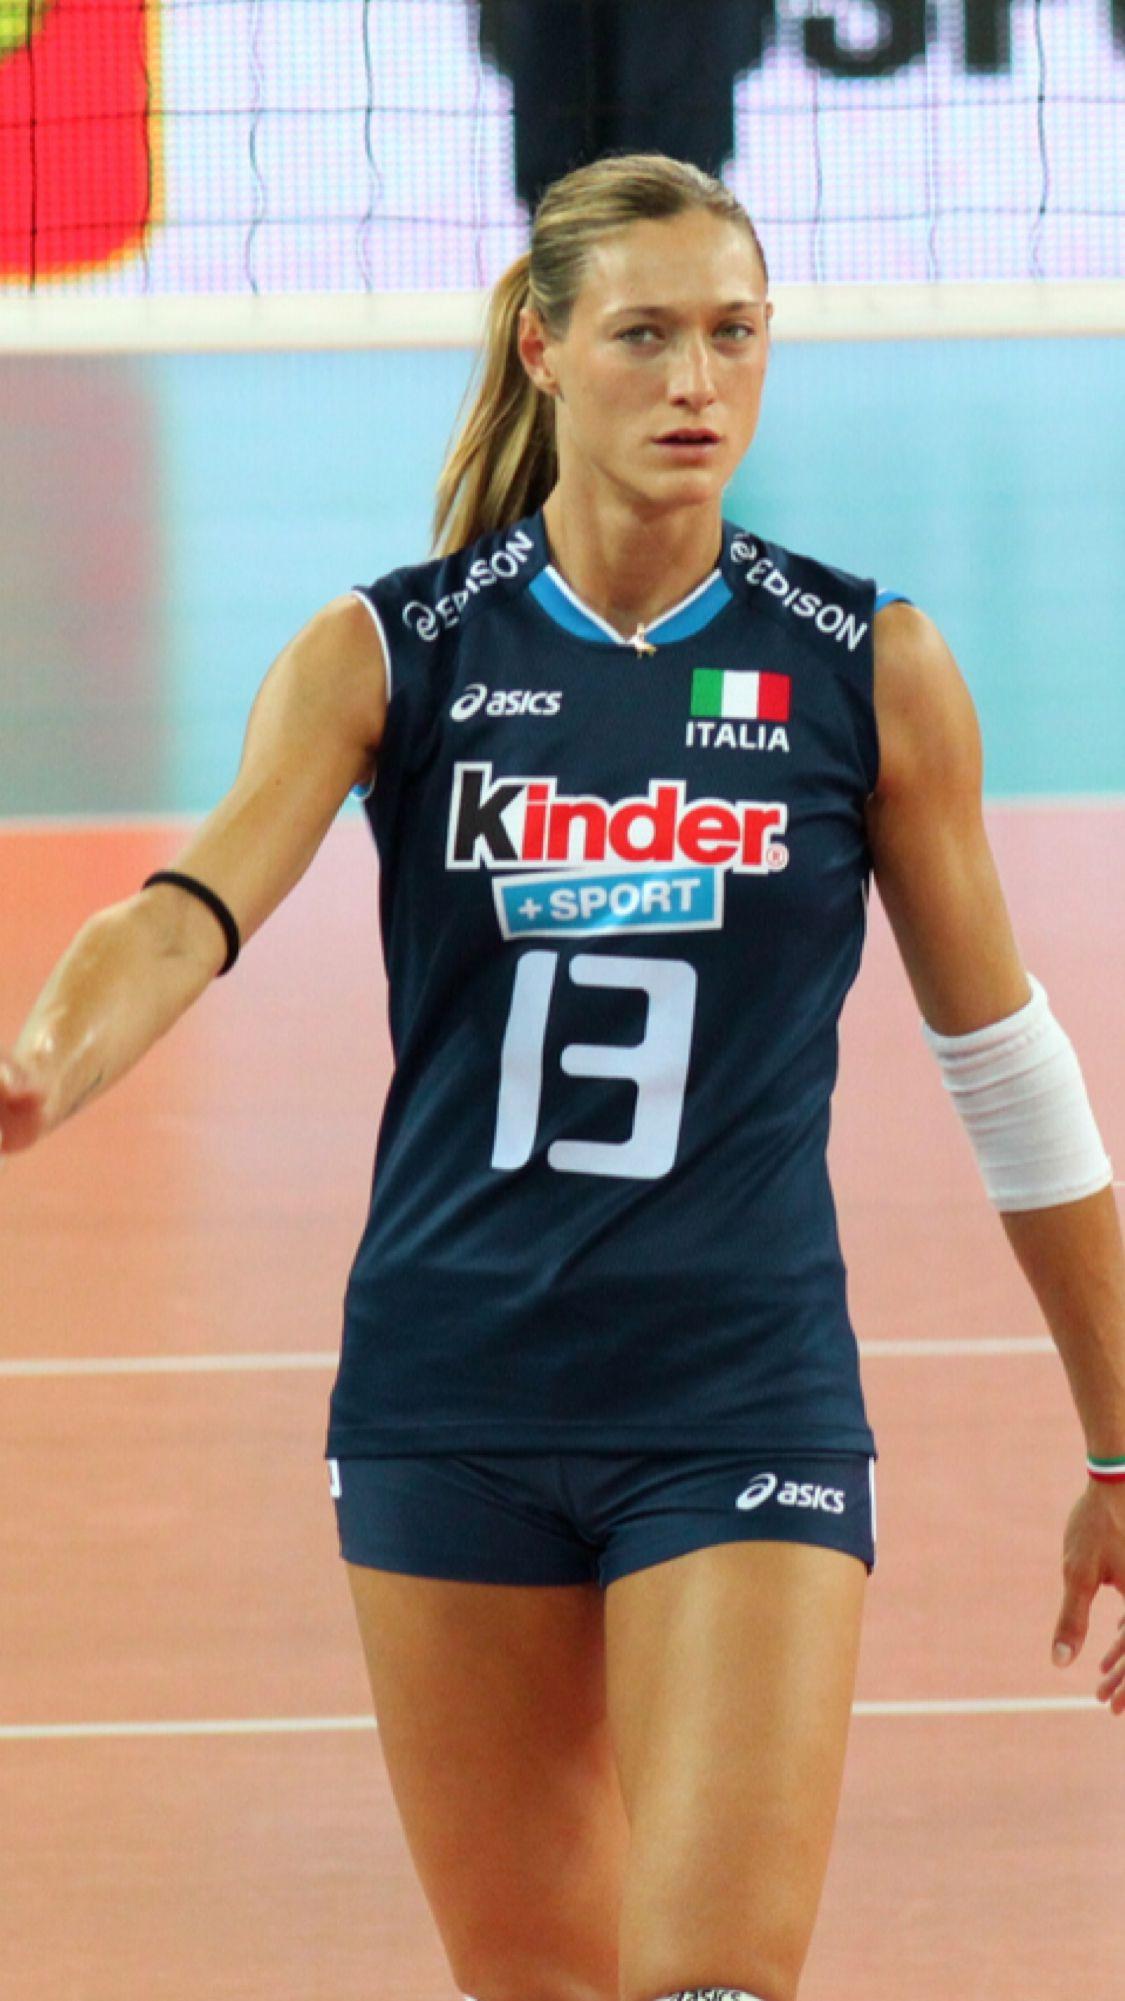 Pin De Greg Manuel Em Volleyball Beauties And Beasts Volei Feminino Ciclismo Feminino Mulheres Atleticas